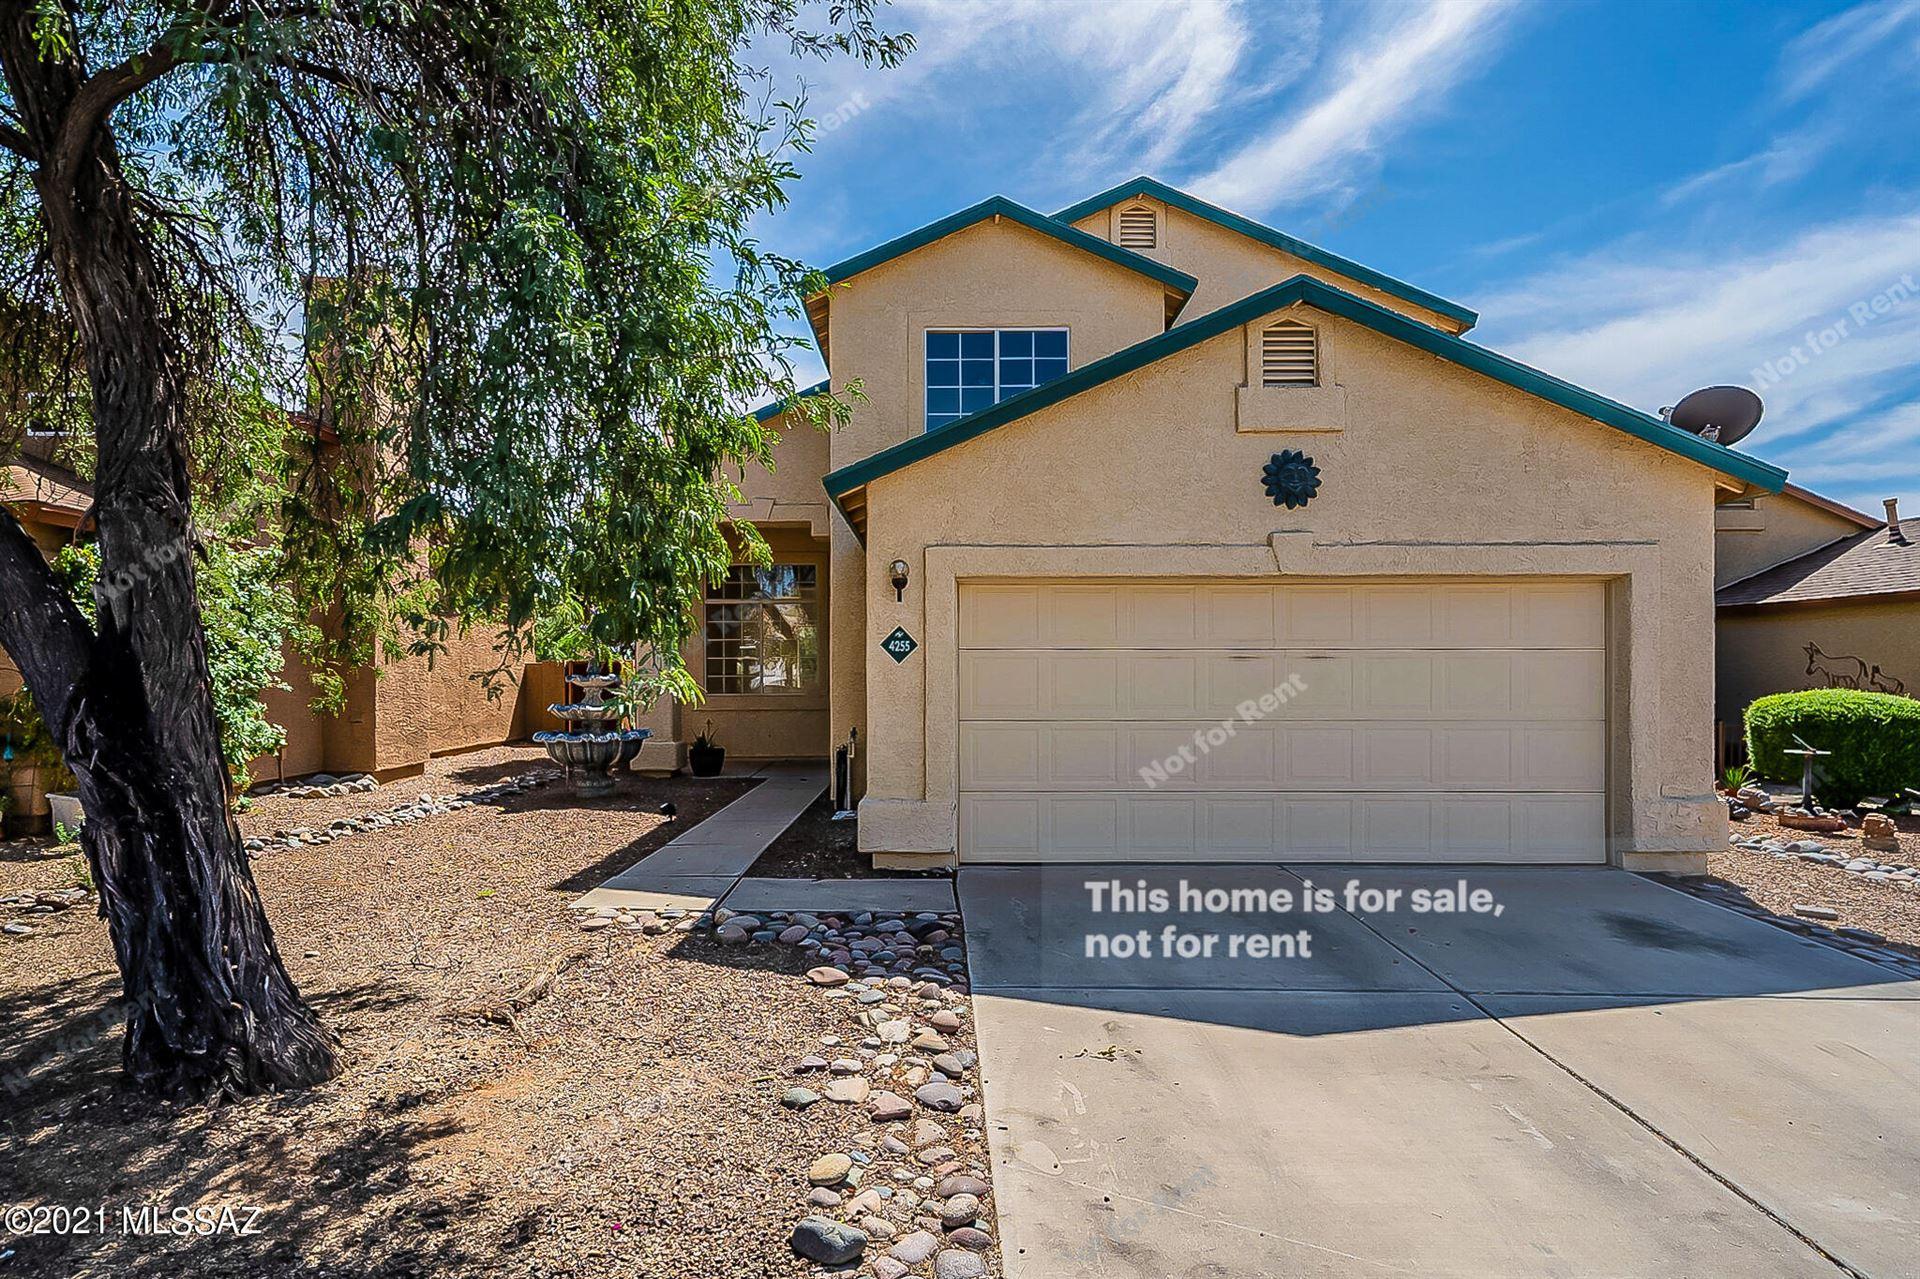 4255 W Bunk House Road, Tucson, AZ 85741 - MLS#: 22124544